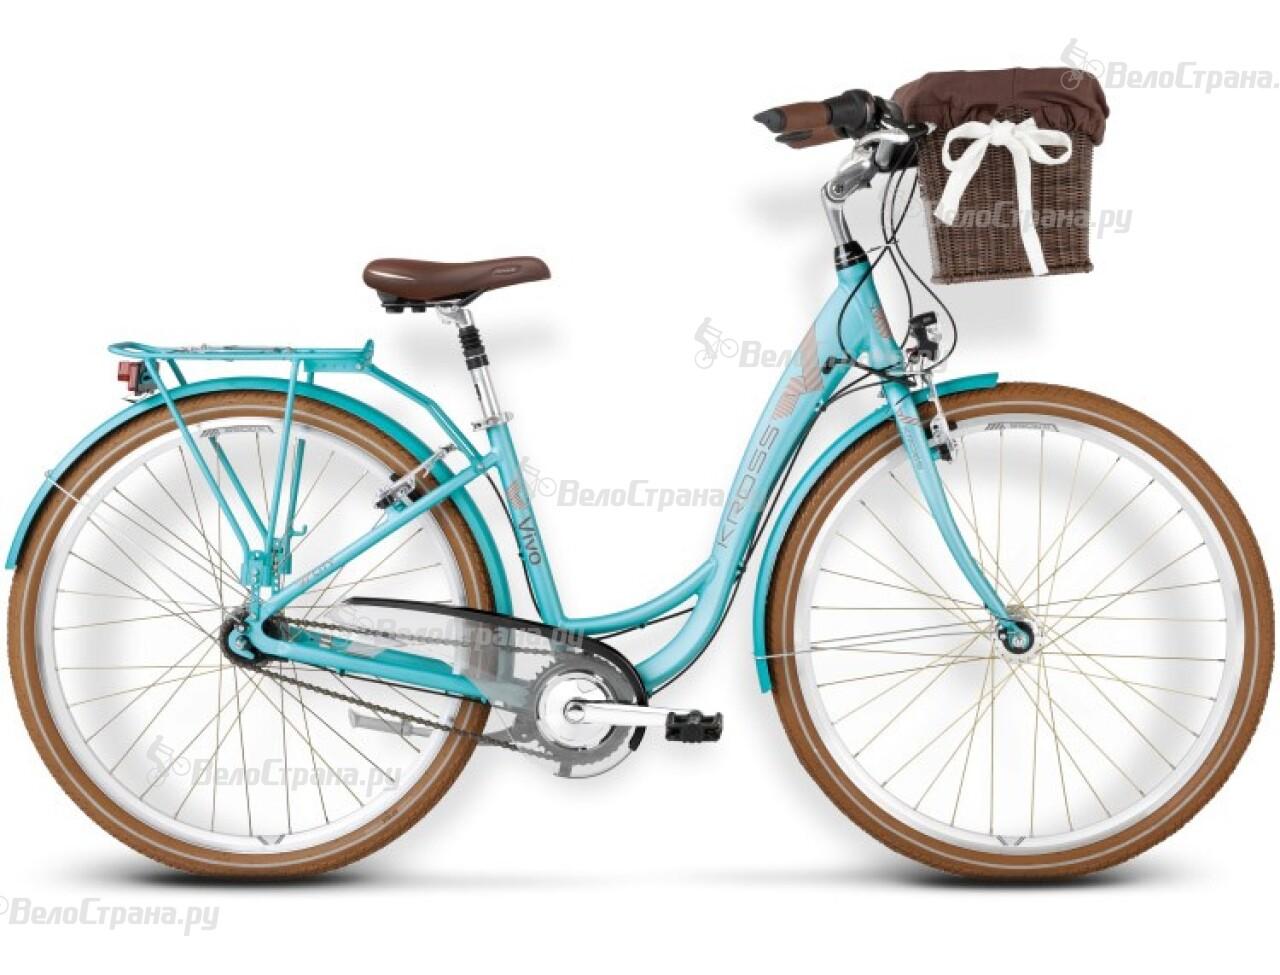 купить Велосипед Kross Vivo (2015) недорого